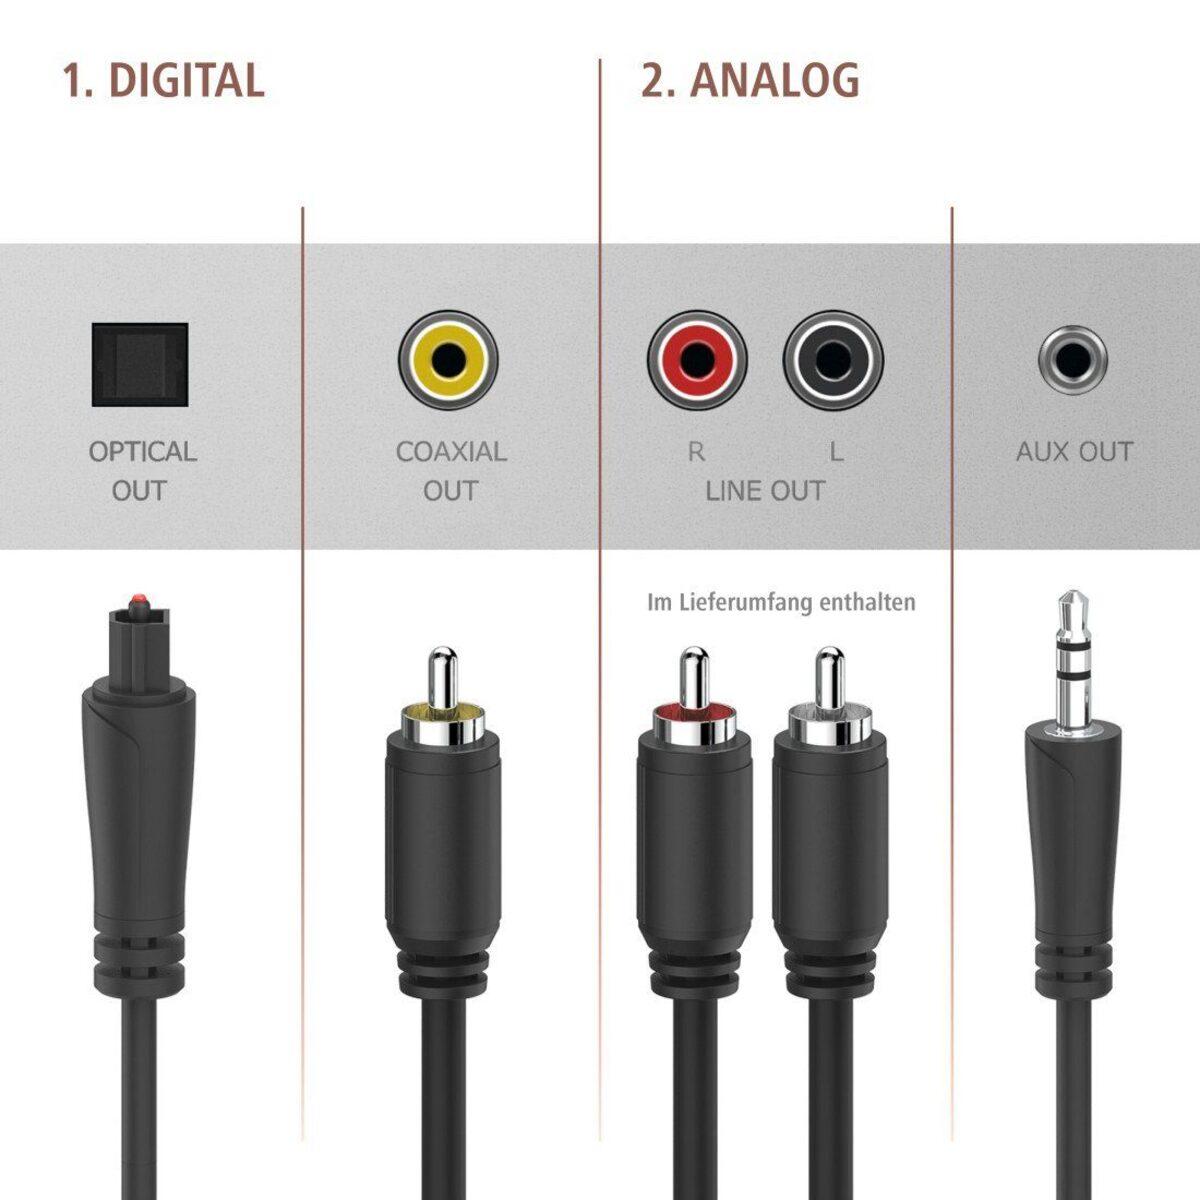 Bild 4 von Hama Digitaltuner, DAB+ Digitalradio/Internetradio/Bluetooth/USB »Aux/DIT2100MSBT«